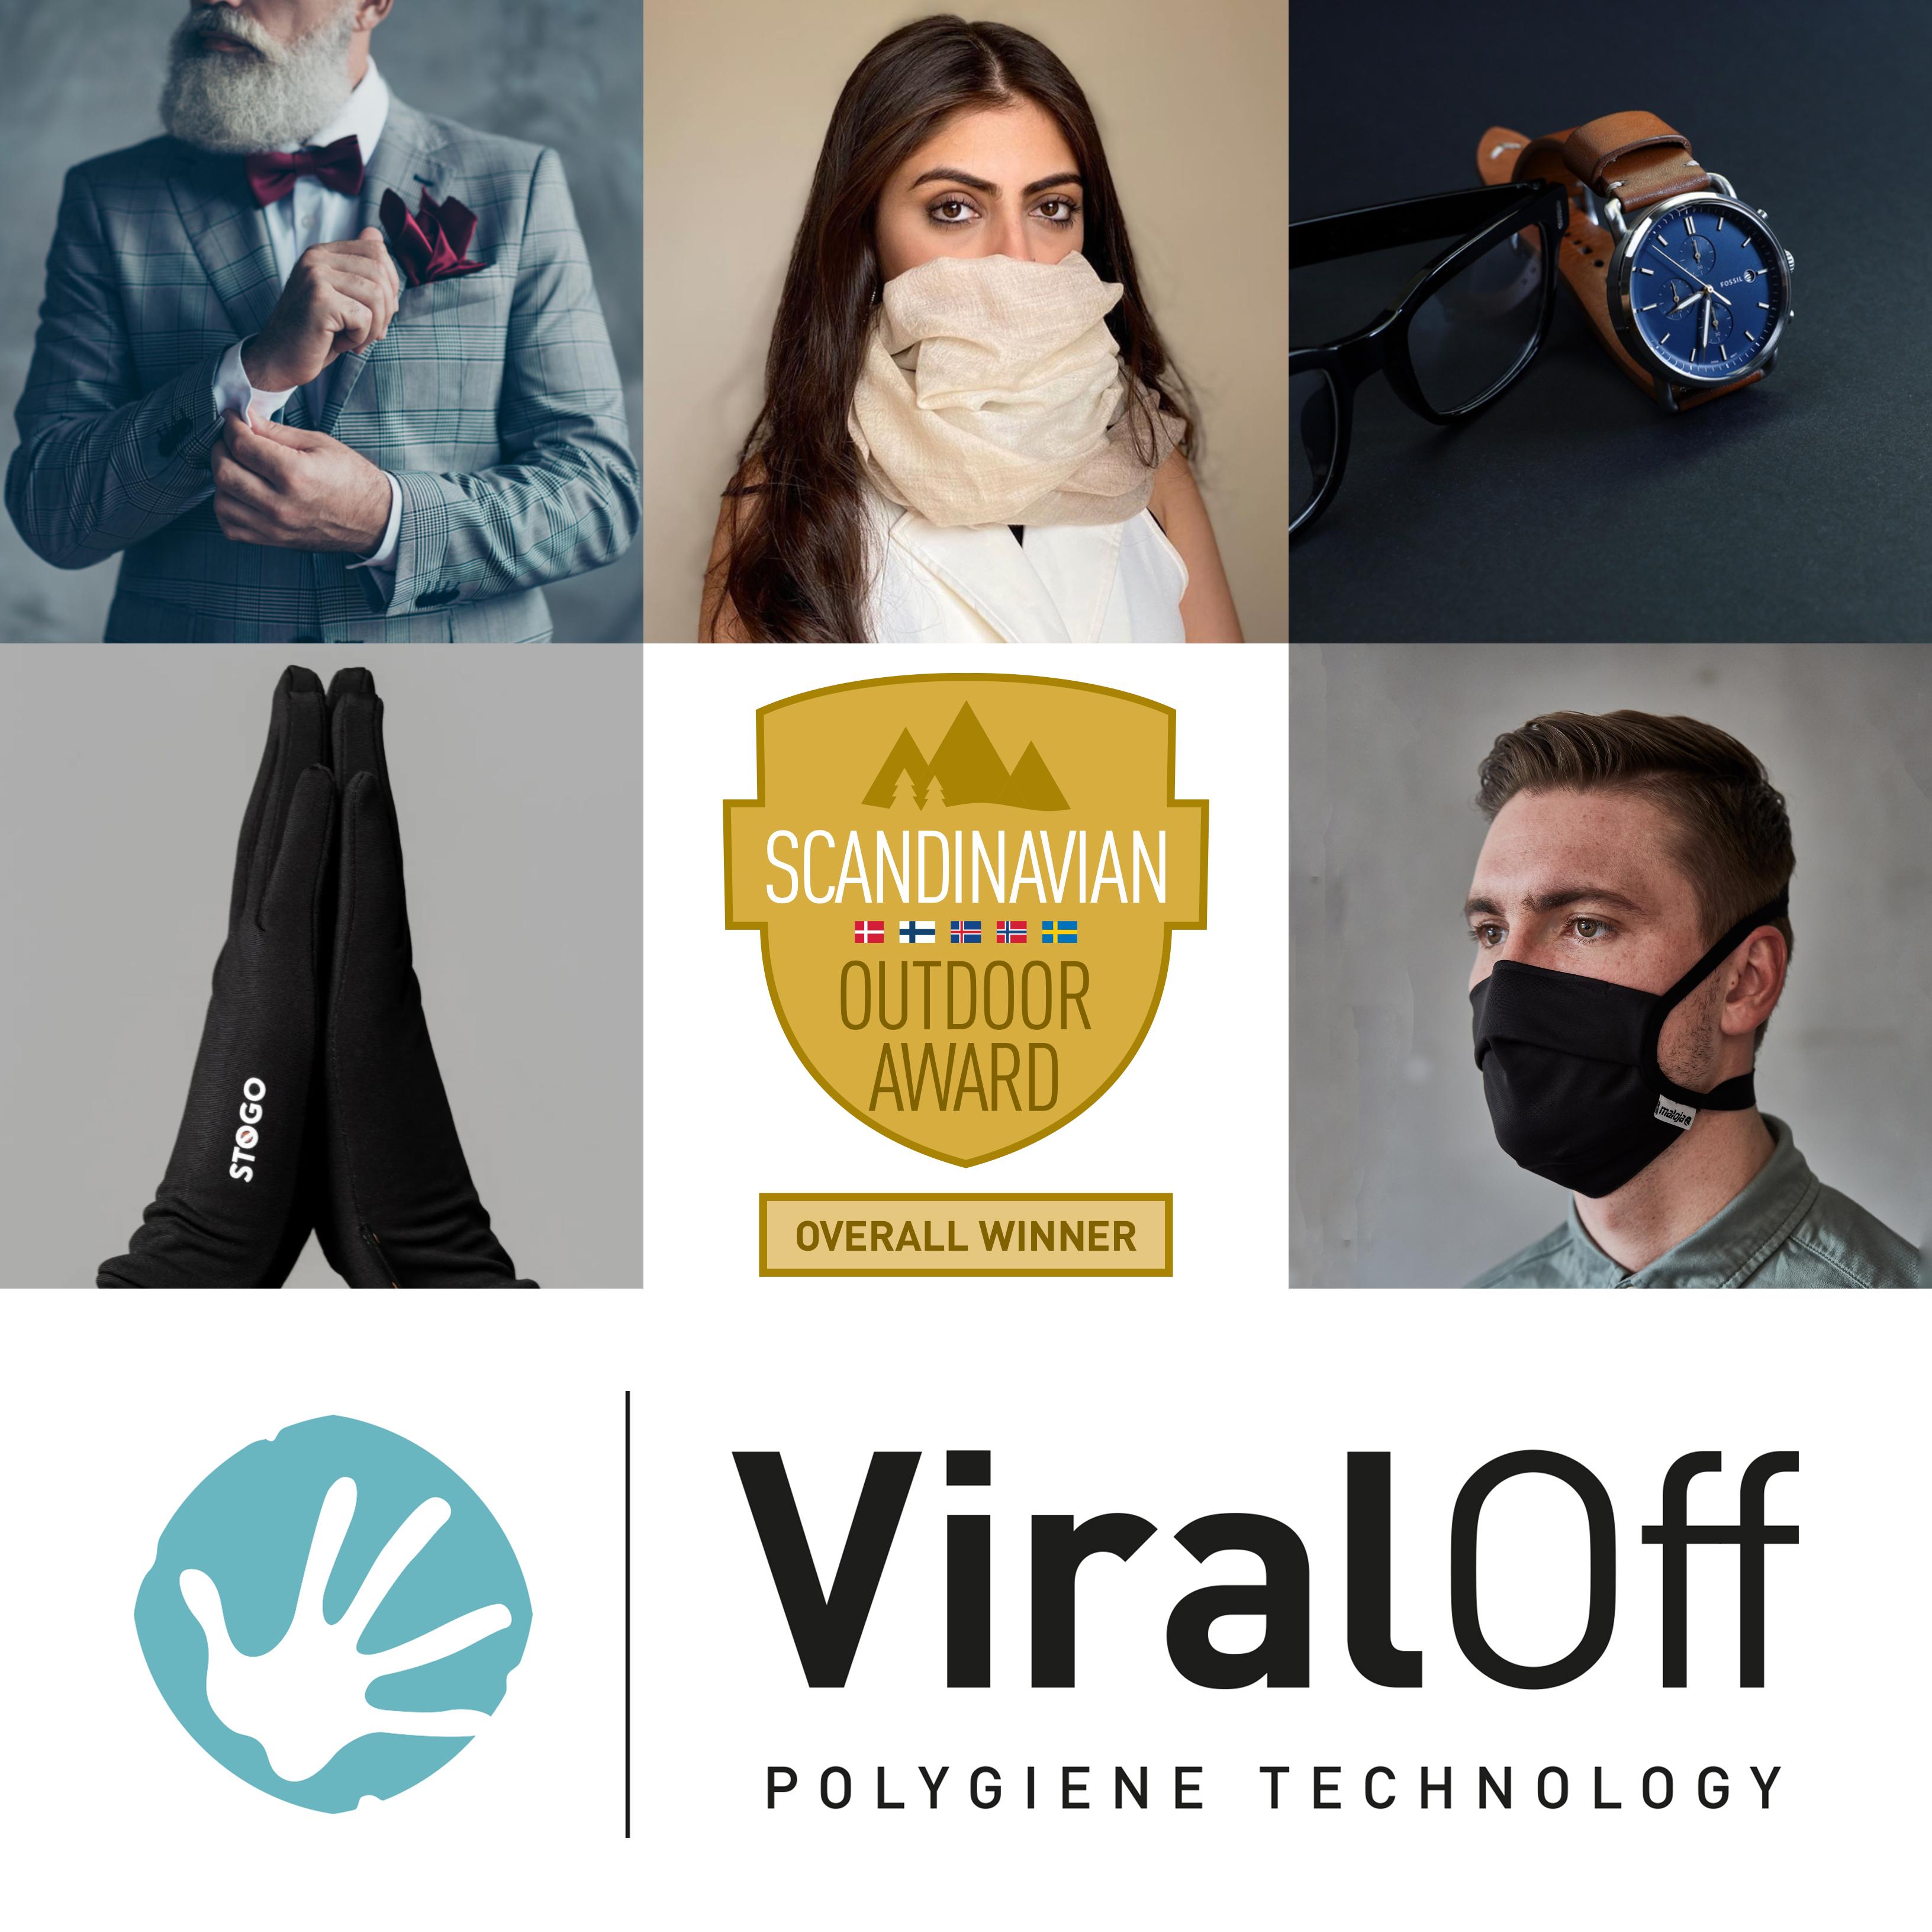 Polygiene totalvinnare i Scandinavian Outdoor Group (SOG) awards 2020